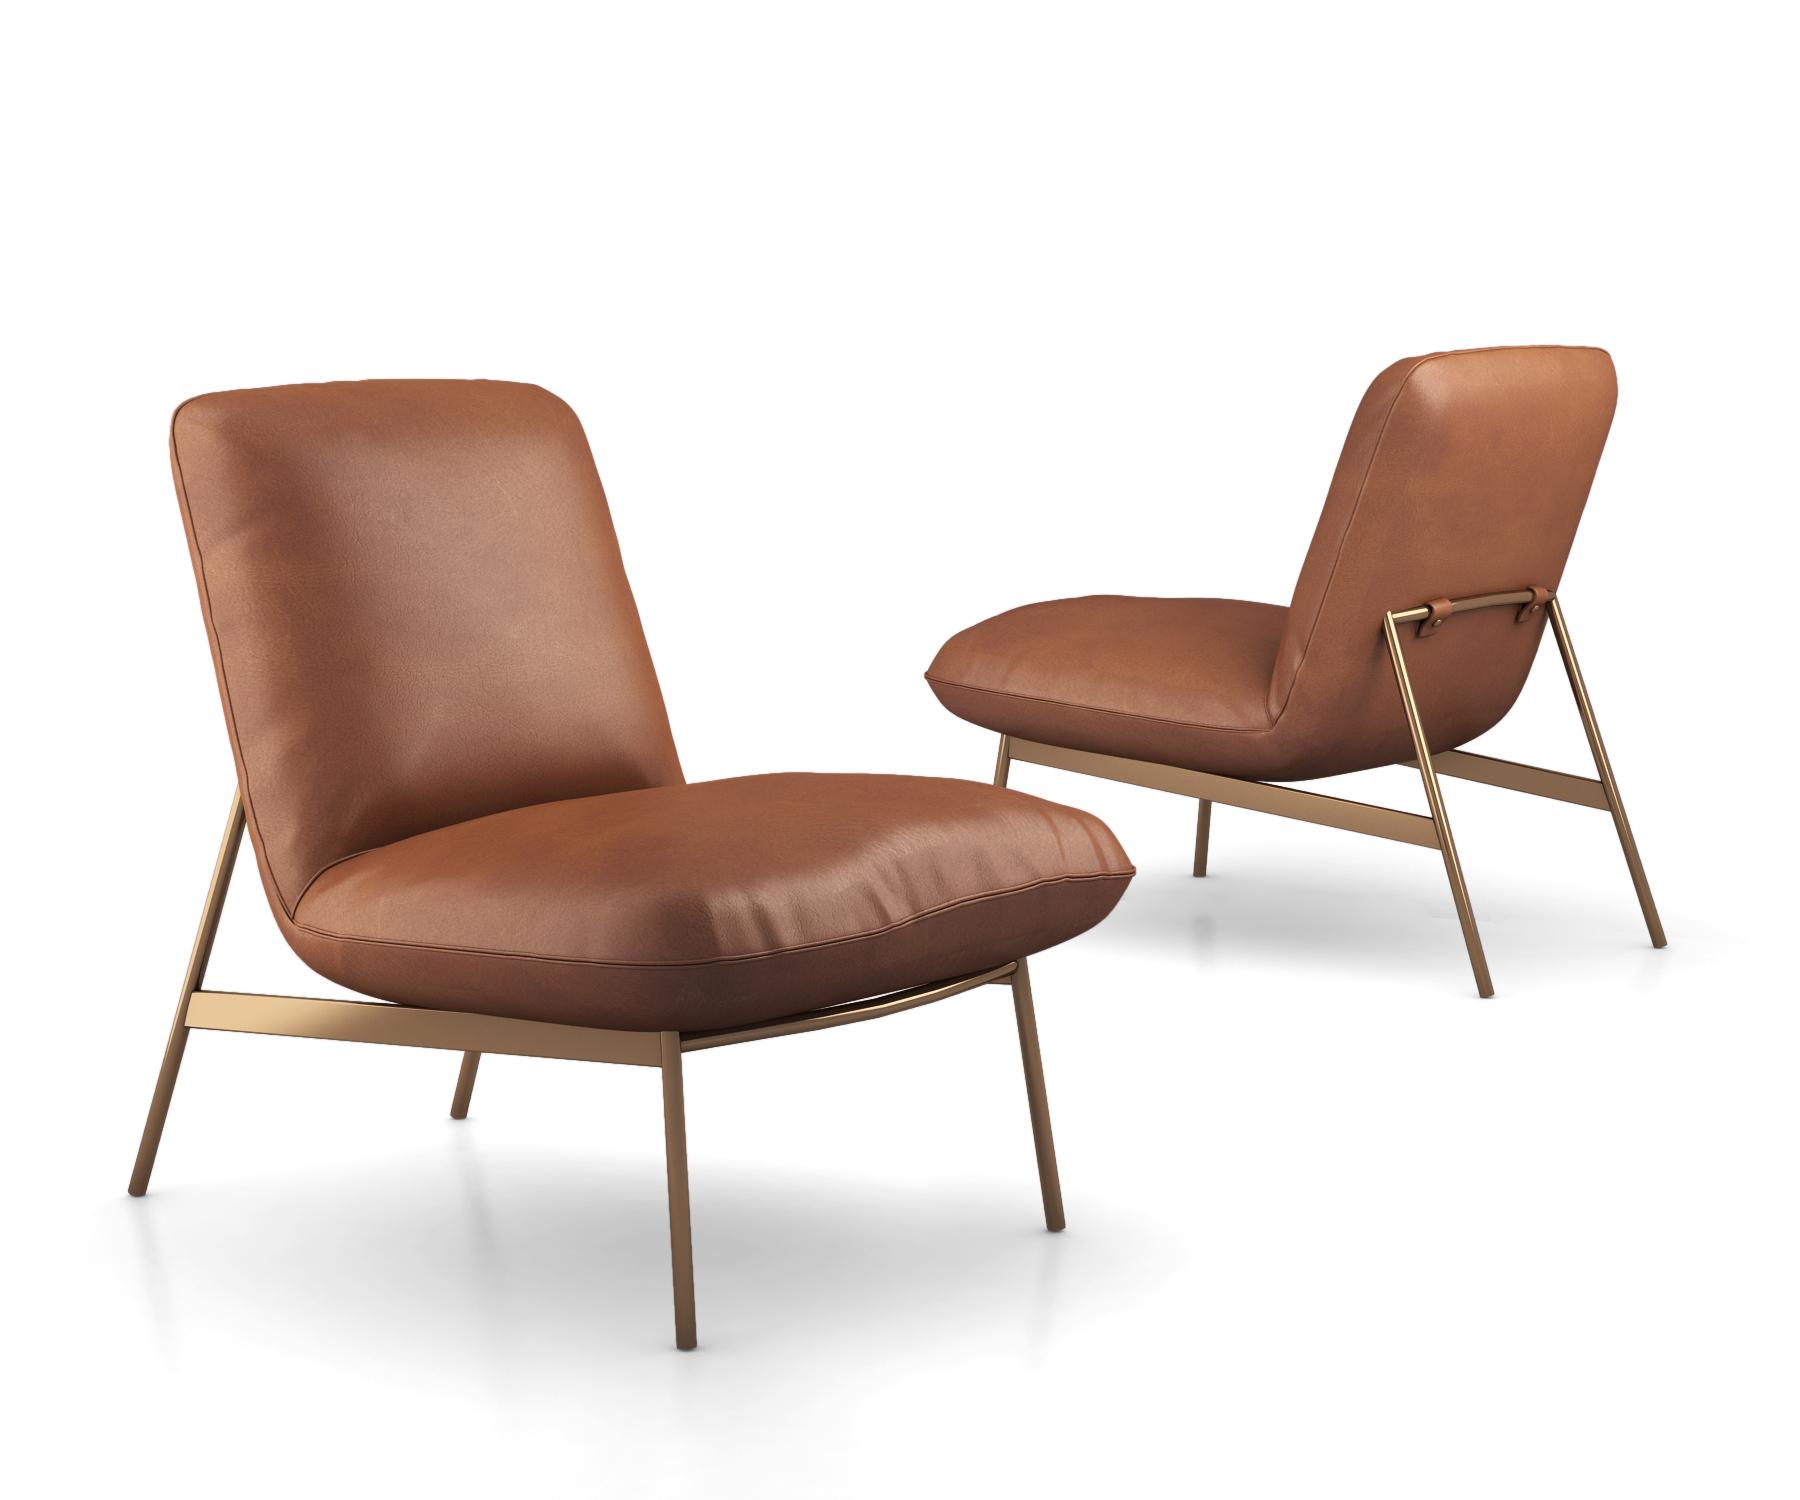 Brilliant Brooks Slipper Chair By West Elm Creativecarmelina Interior Chair Design Creativecarmelinacom